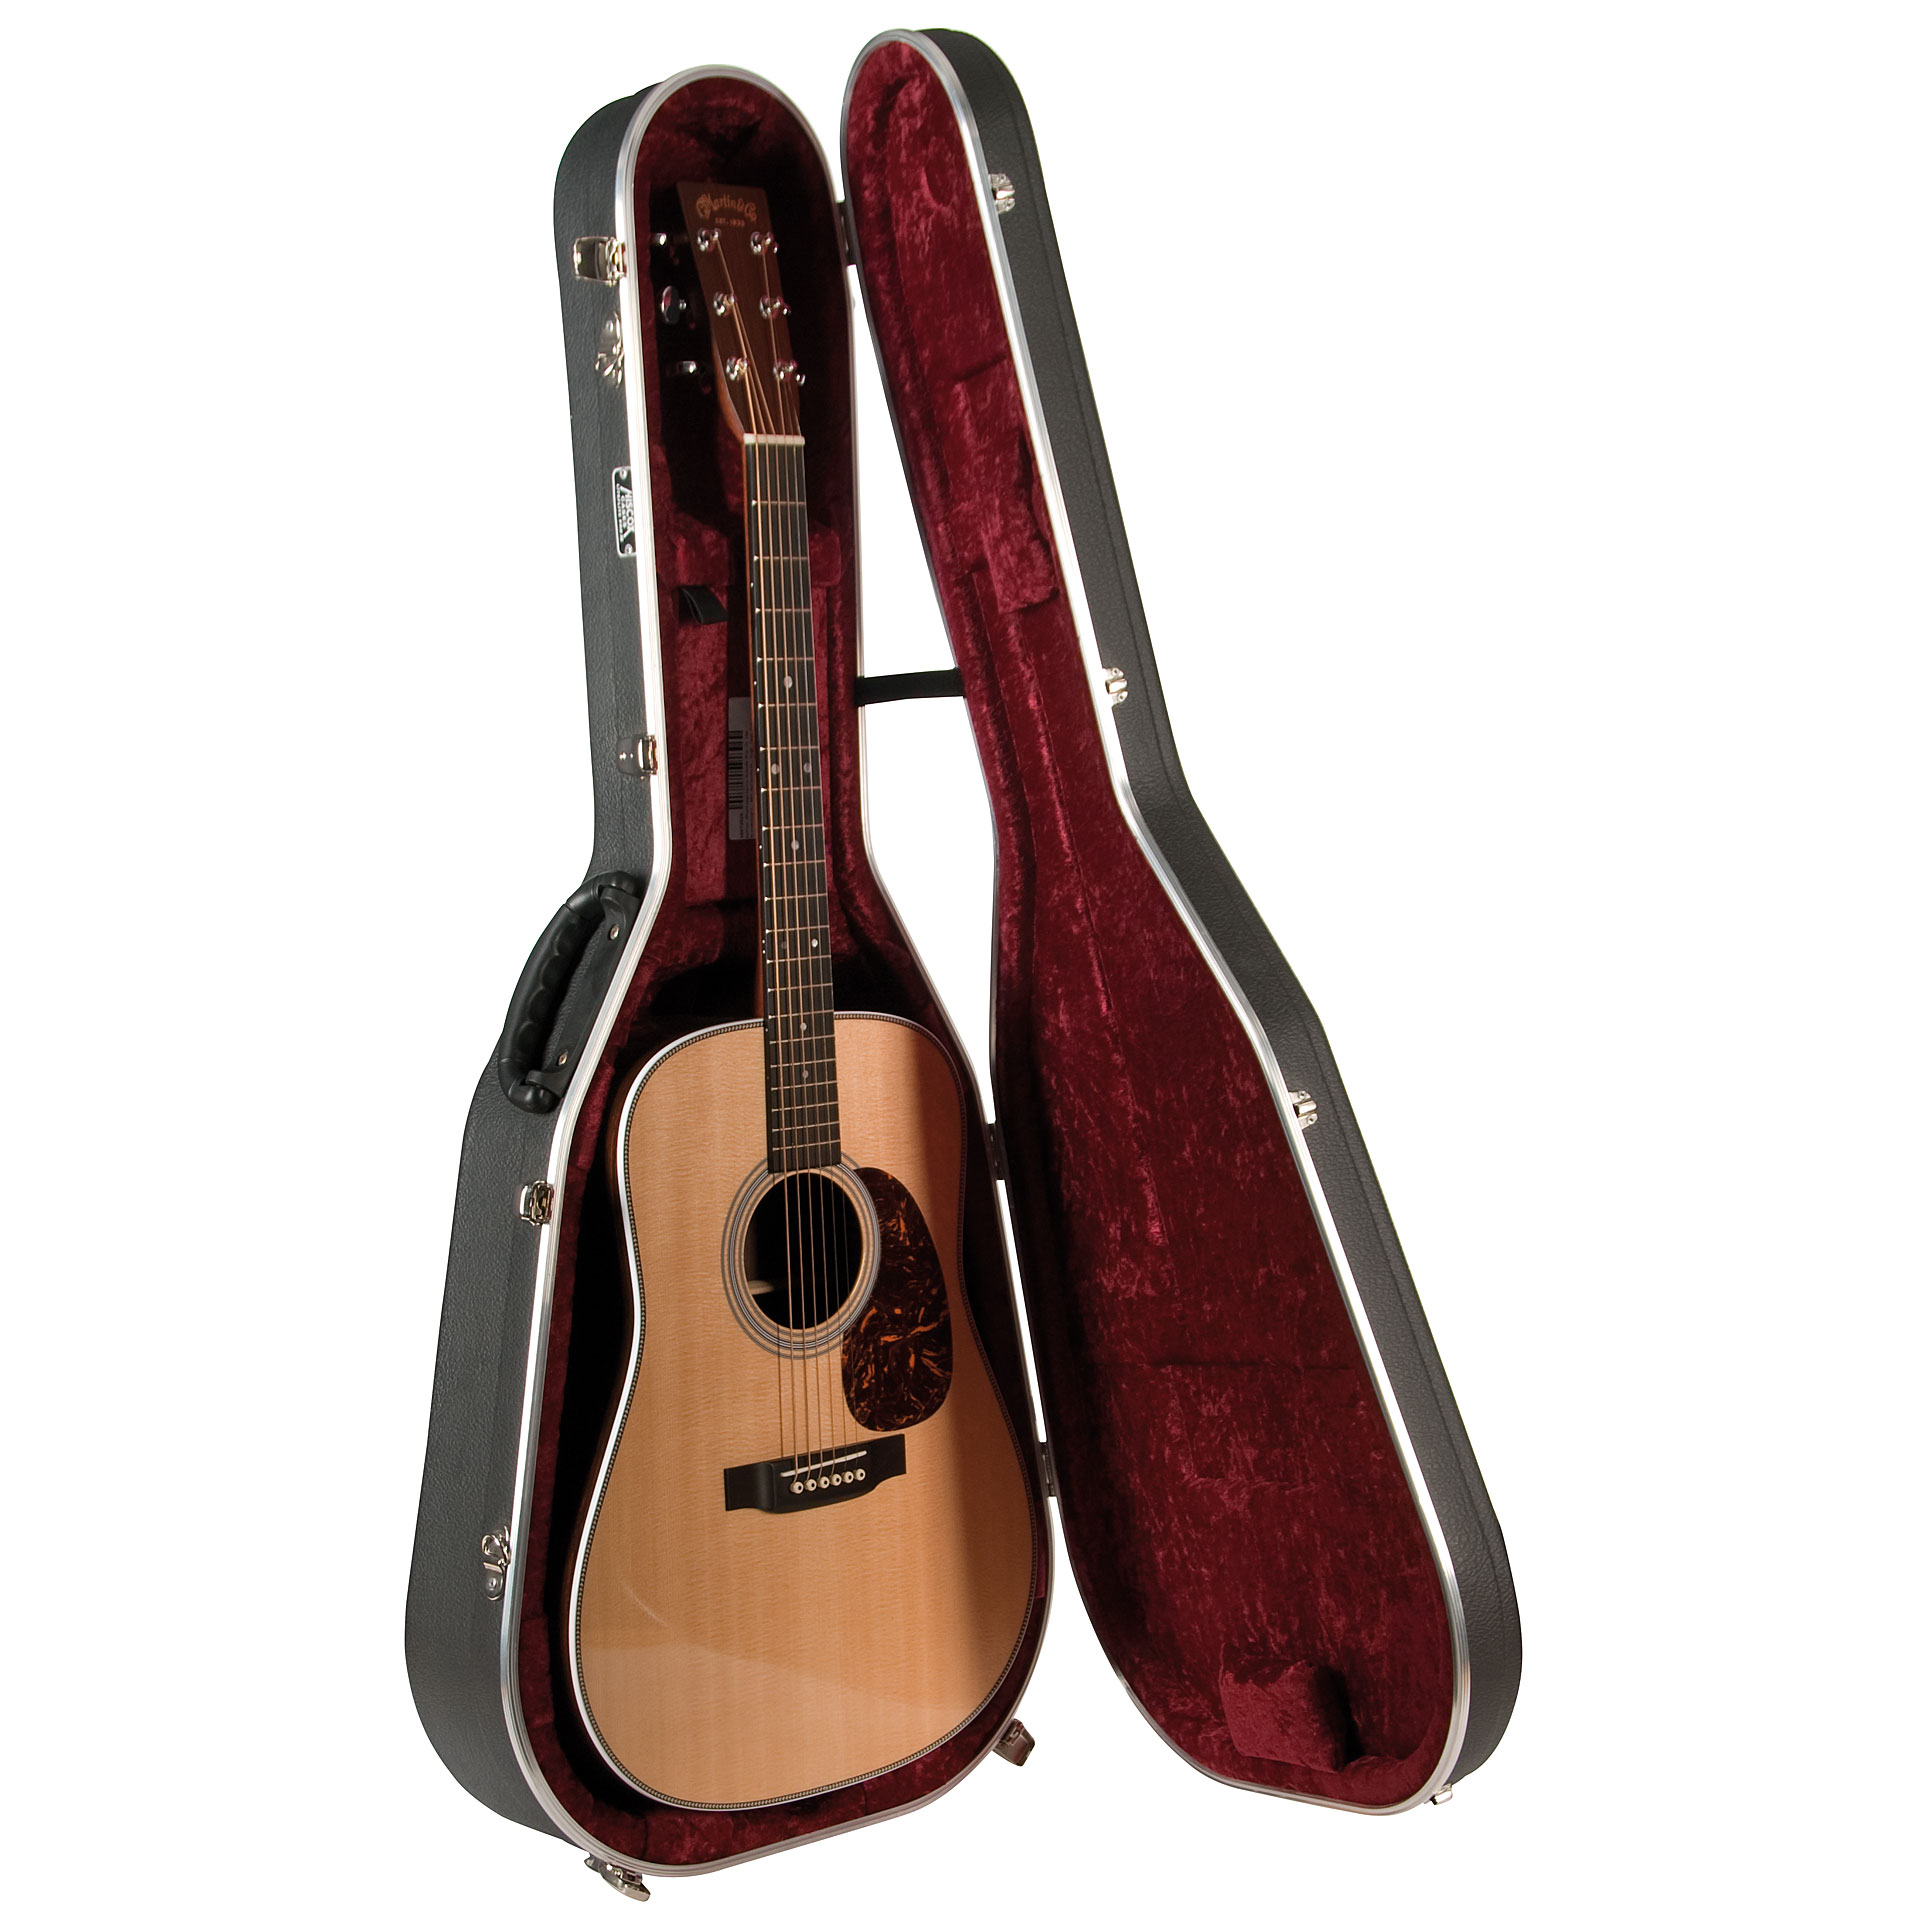 hiscox pro ii gad acoustic guitar case. Black Bedroom Furniture Sets. Home Design Ideas